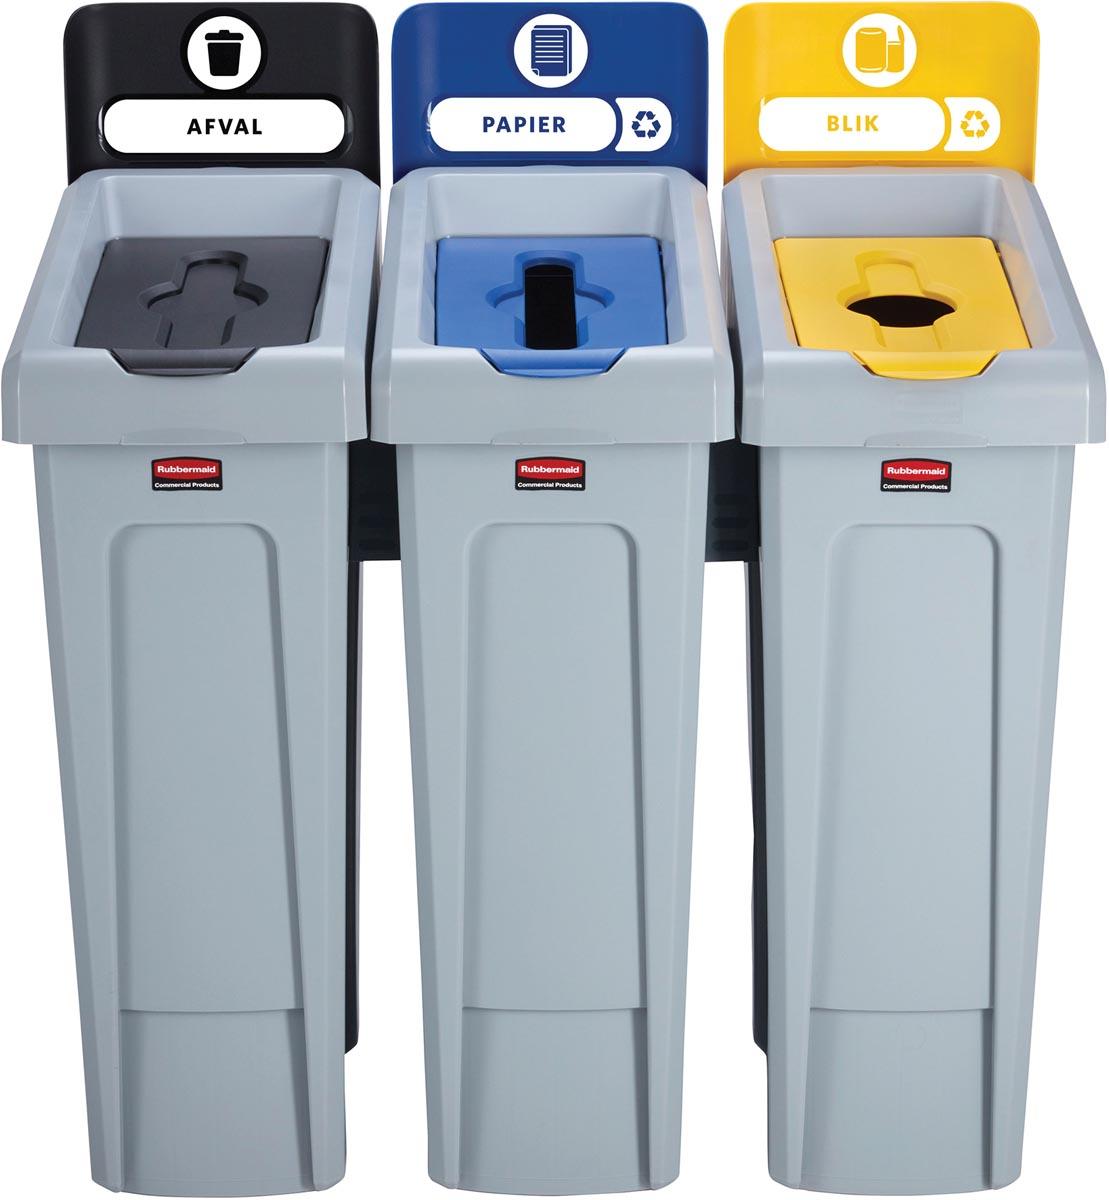 Rubbermaid Slim Jim Recyclingstation voor afval, papier en kunststof, zwart / blauw / geel